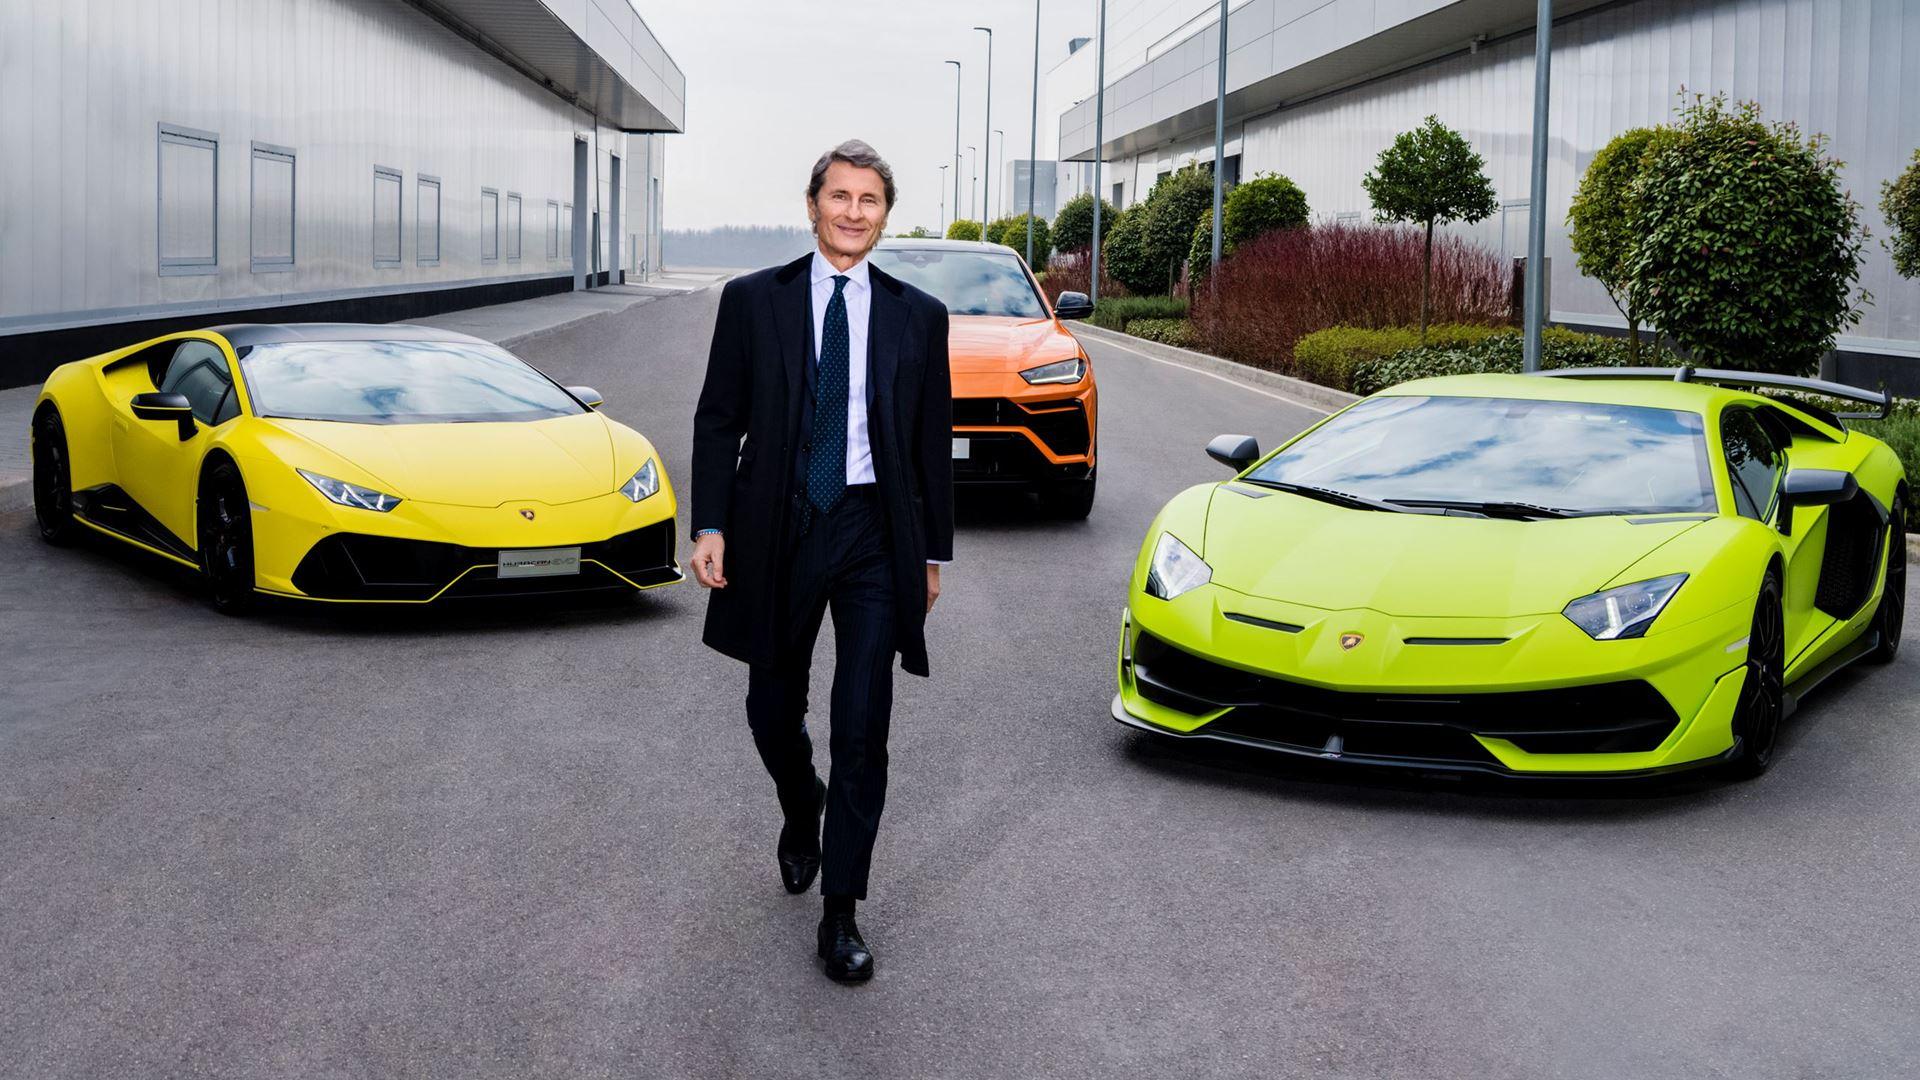 Automobili Lamborghini: sales soaring, record first quarter - Image 2